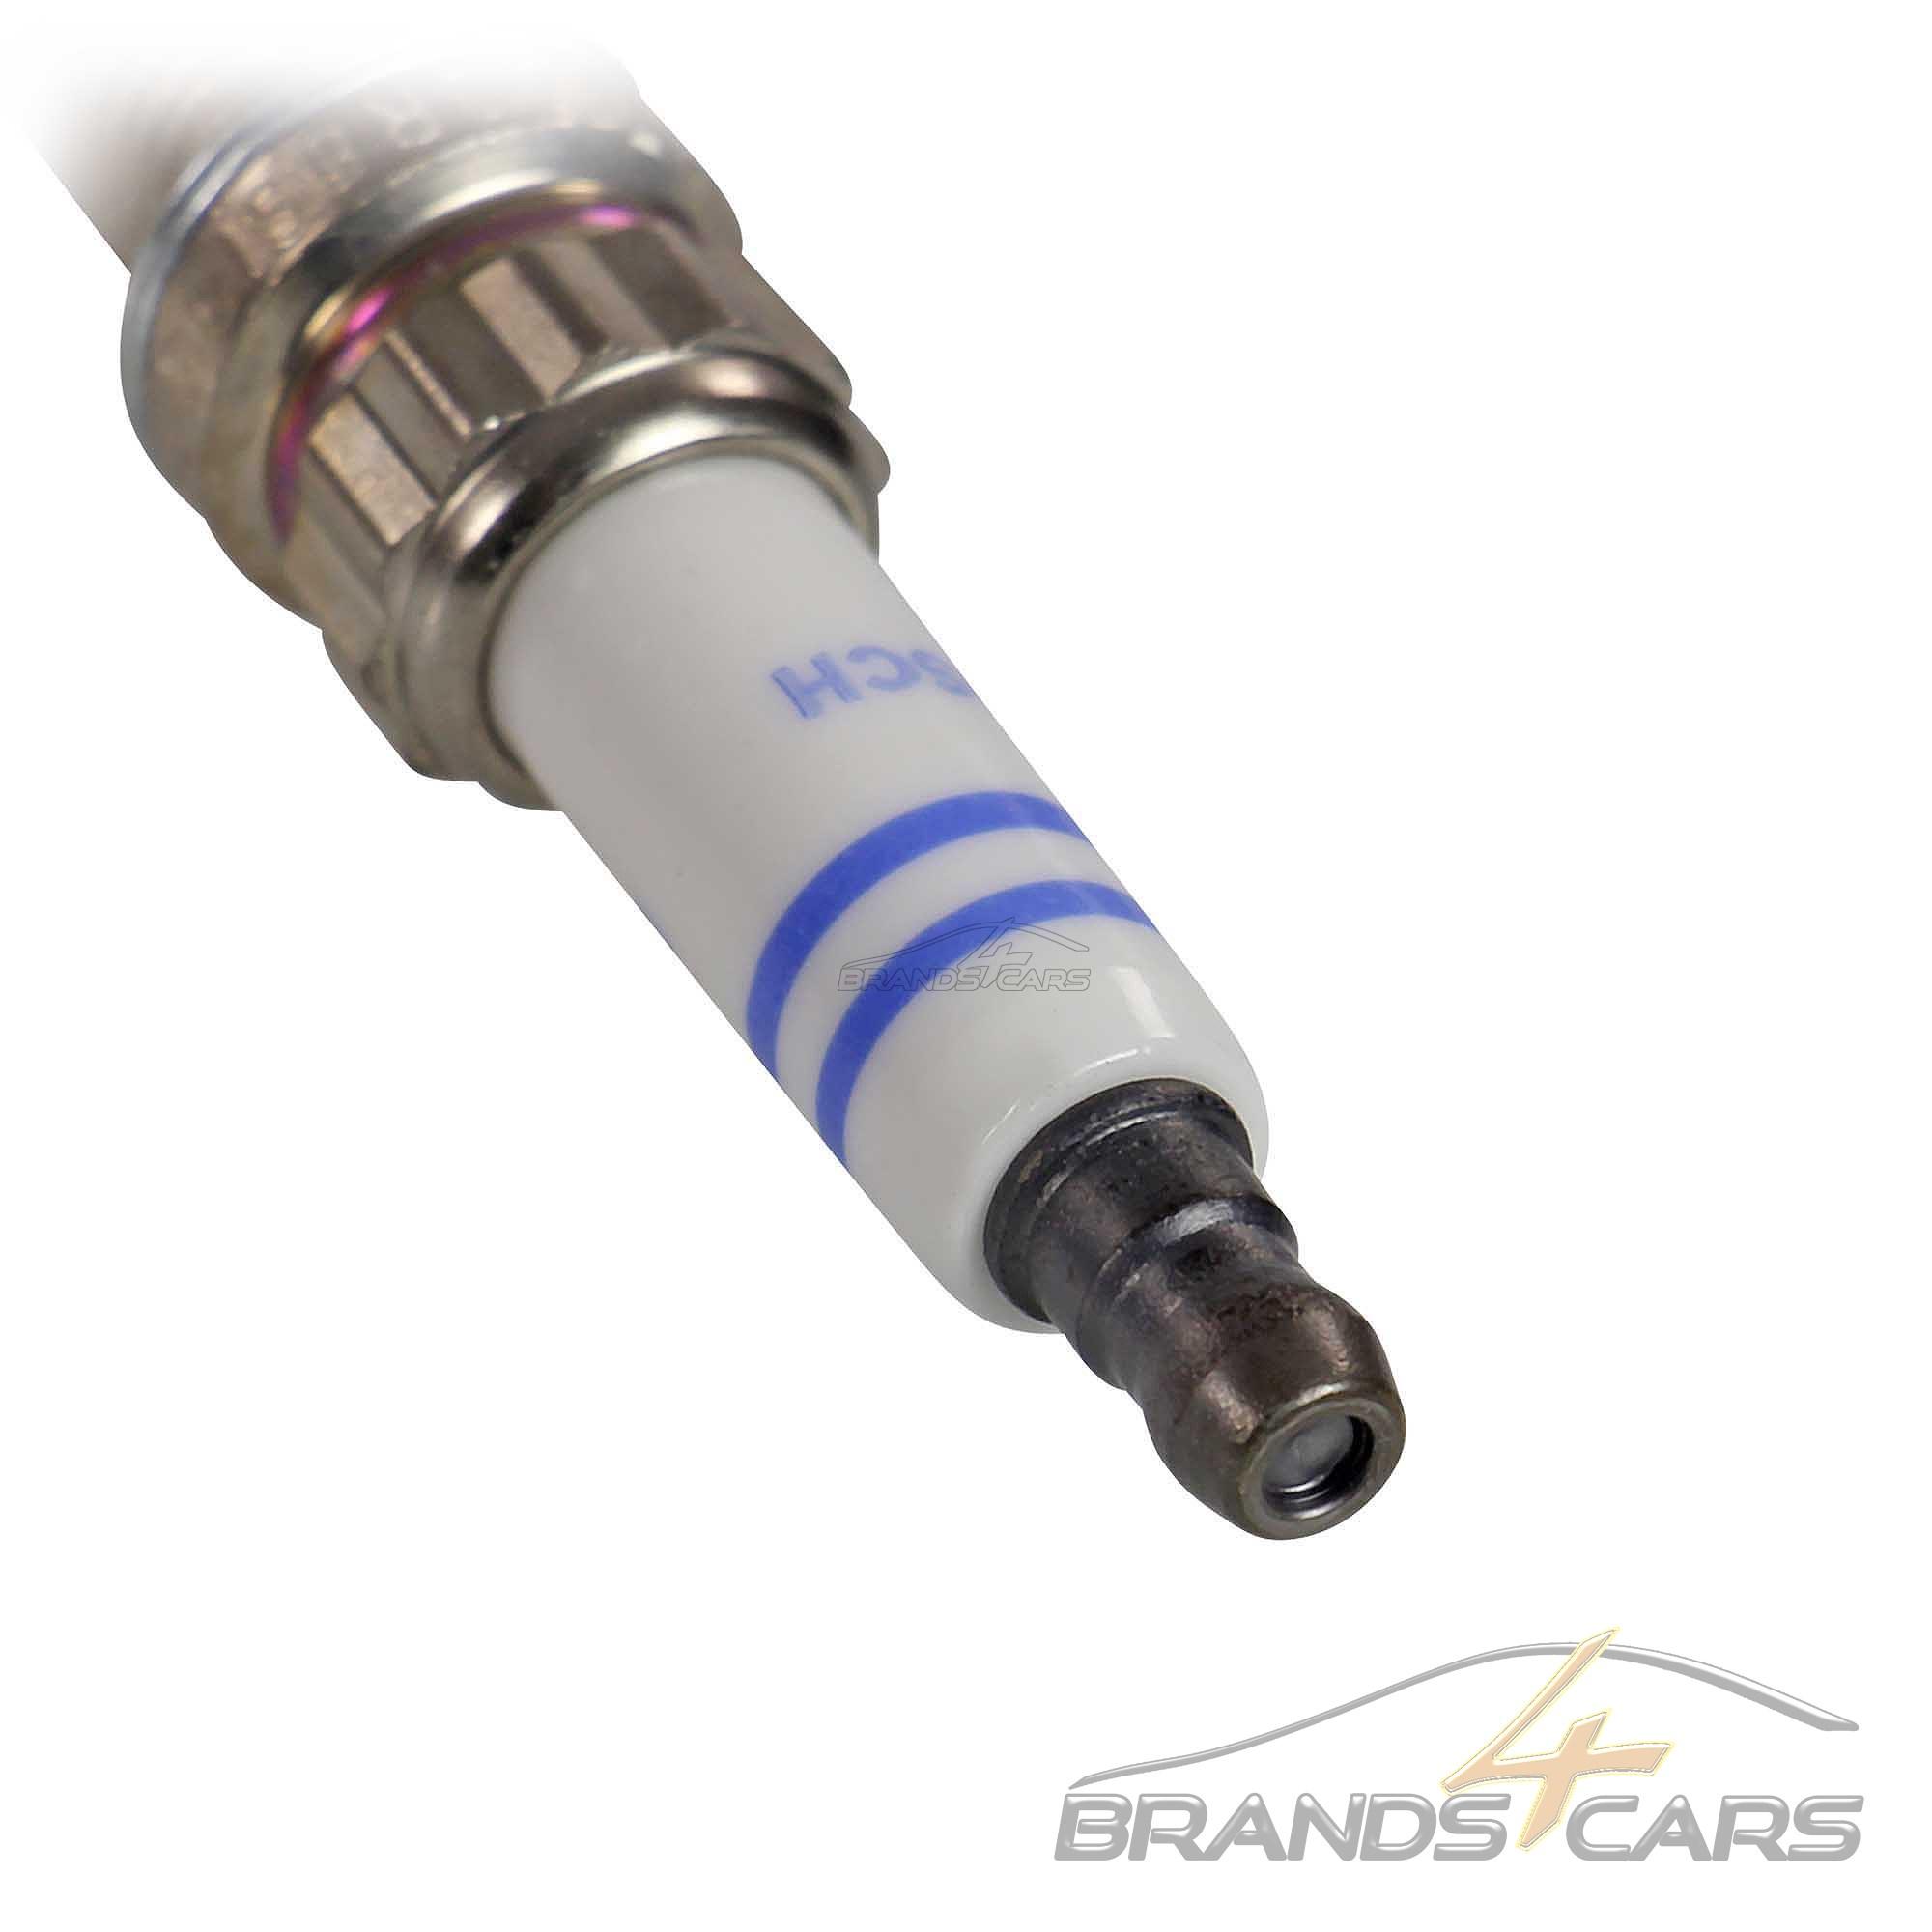 4x-Bosch-original-bujia-bujias-mini-mini-r56-r57-club-hombre-r55-one-Cooper miniatura 4